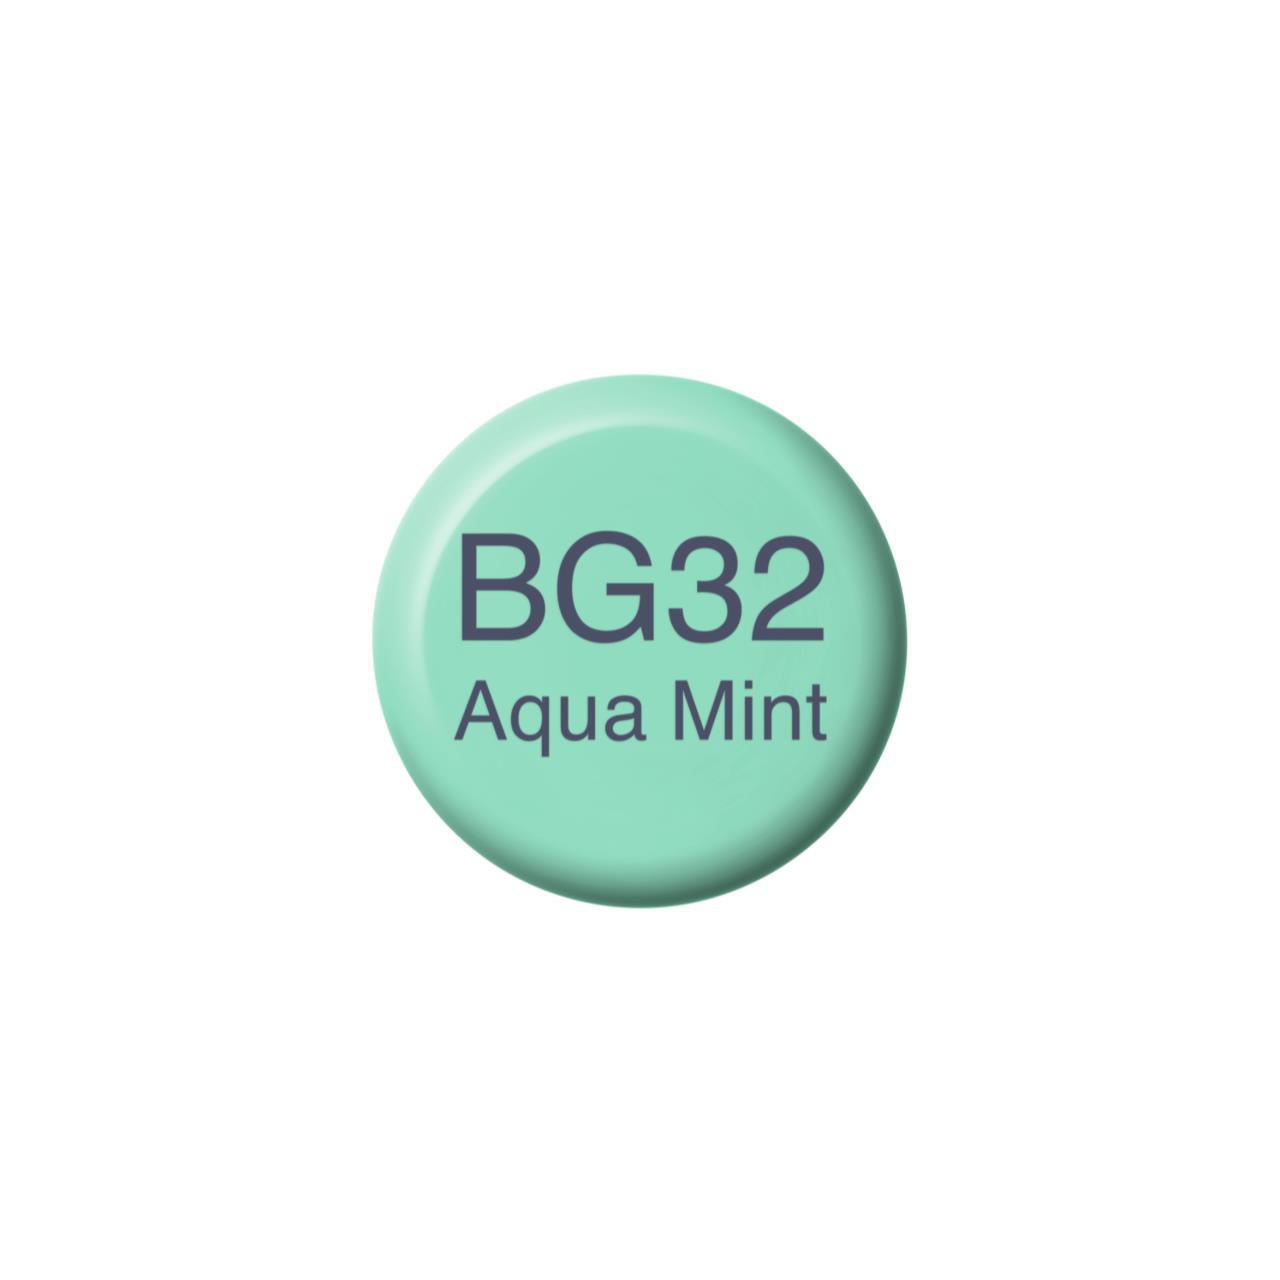 BG32 Aqua Mint, Copic Ink - 4511338056288